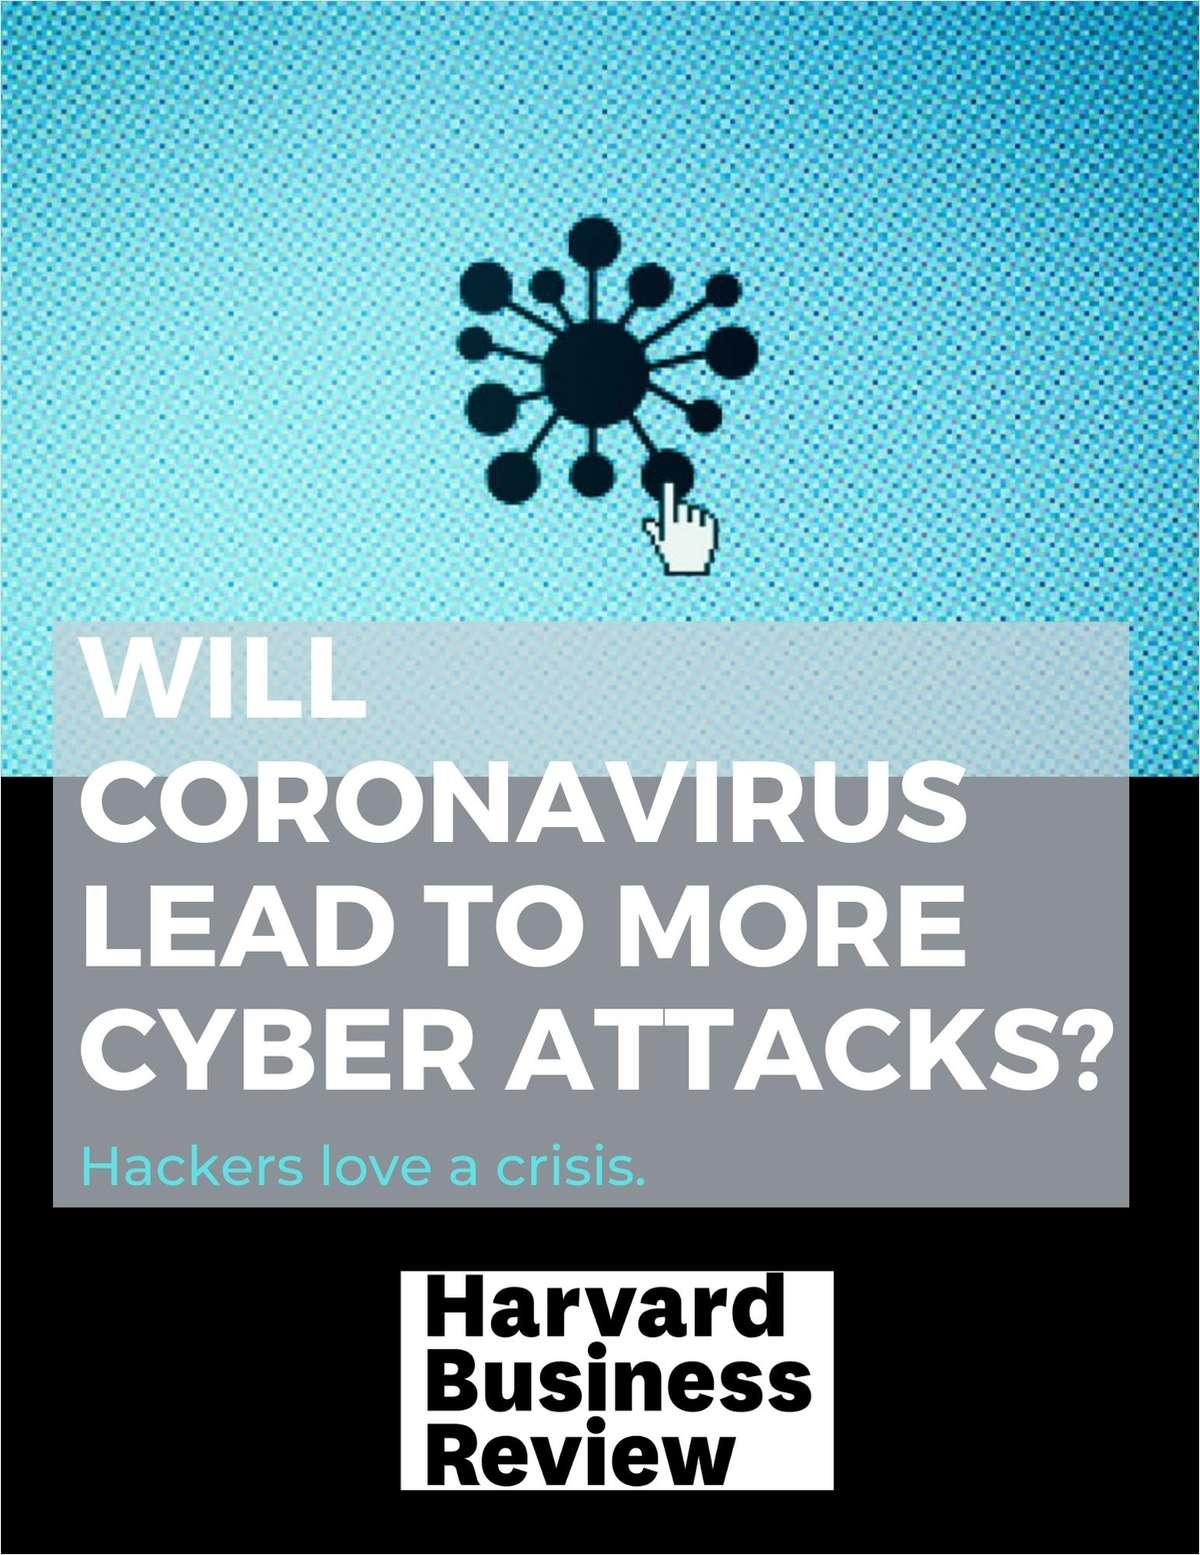 Will Coronavirus Lead to More Cyber Attacks?